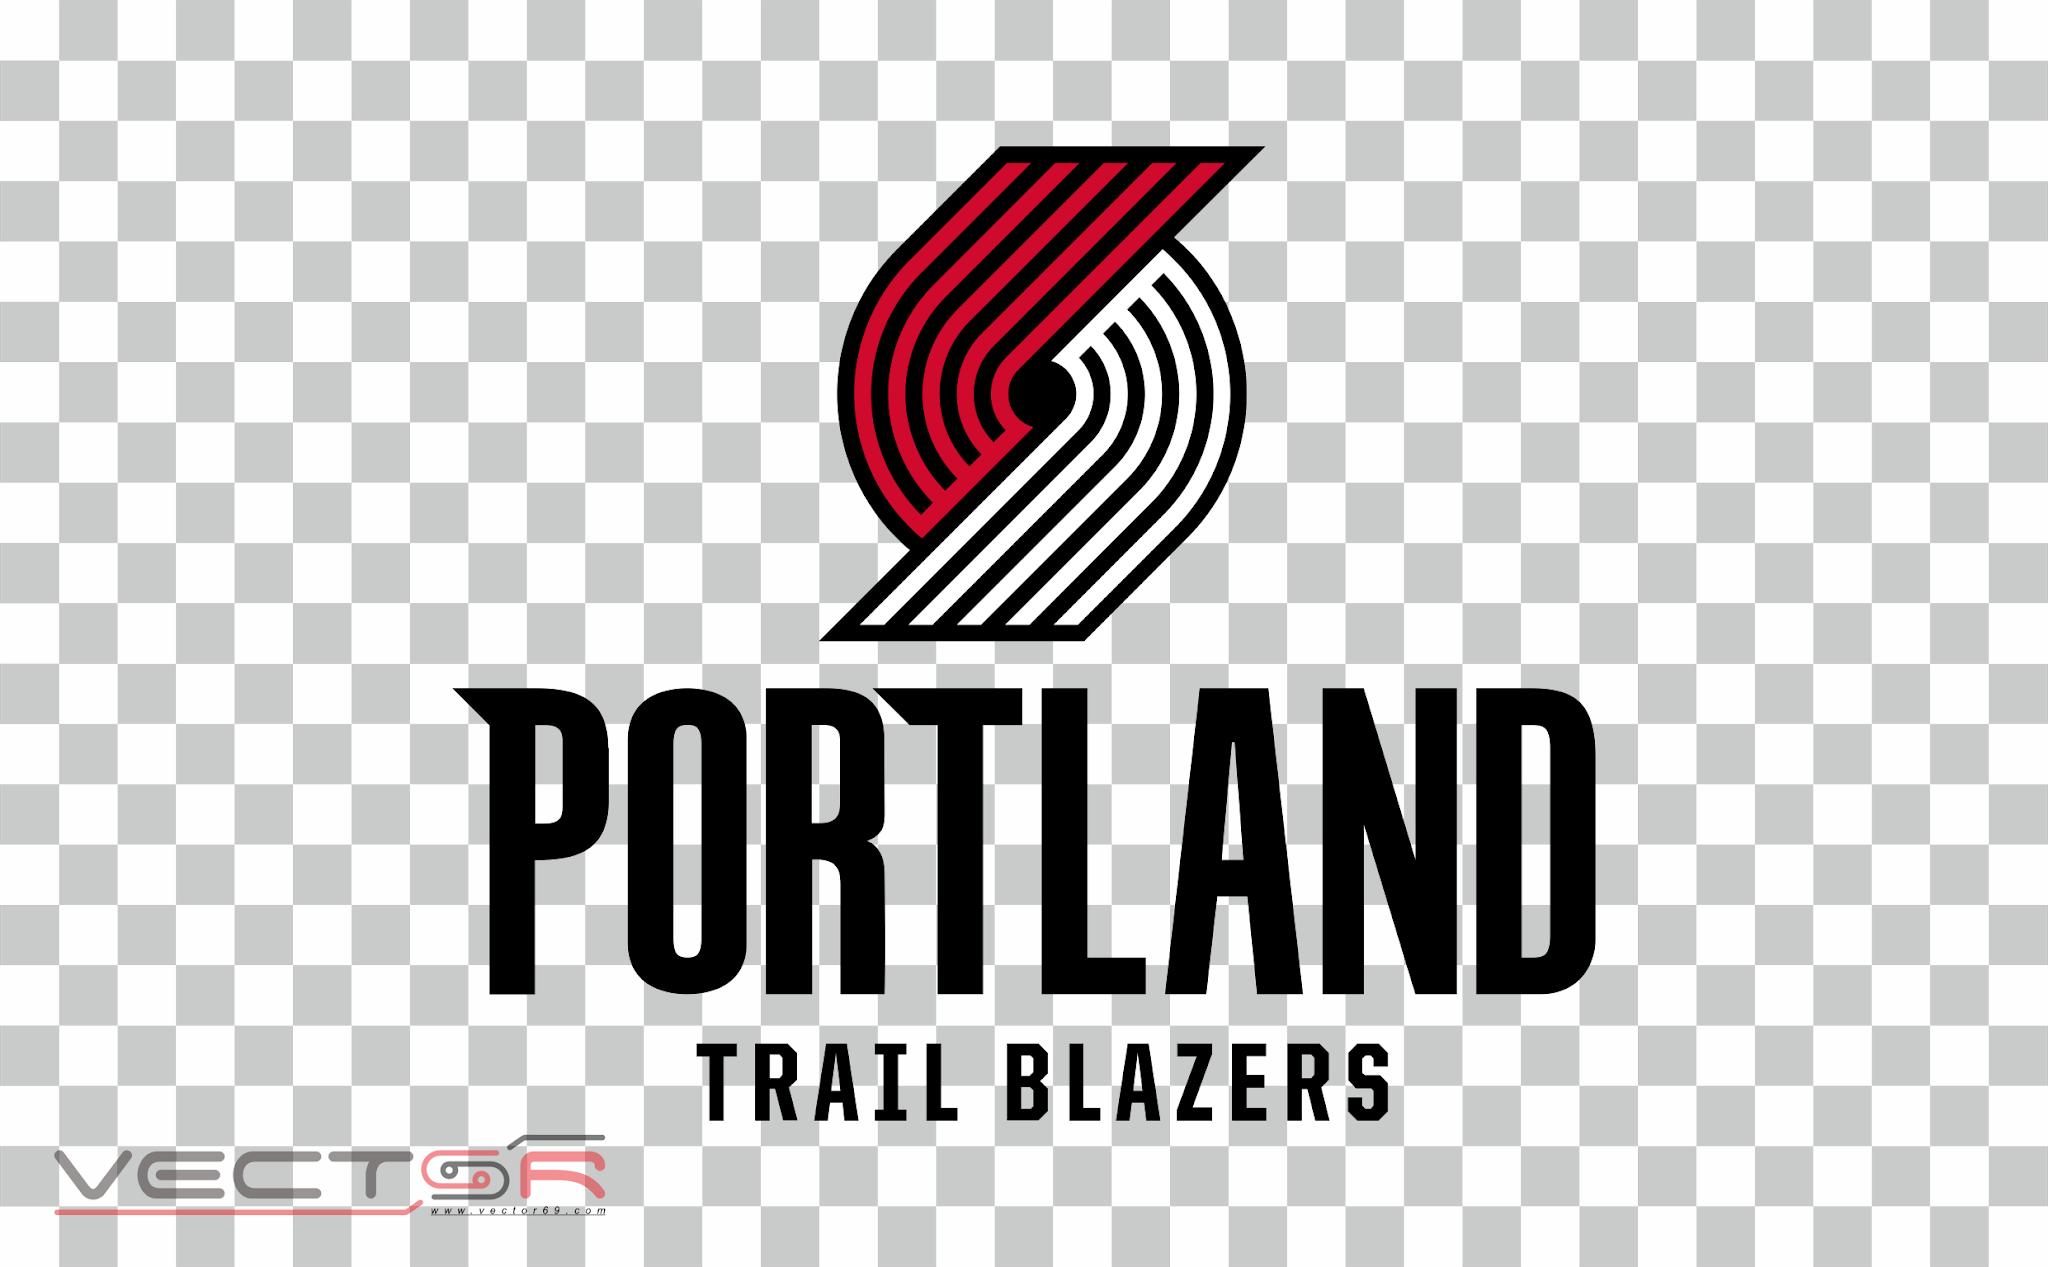 Portland Trail Blazers Logo - Download .PNG (Portable Network Graphics) Transparent Images